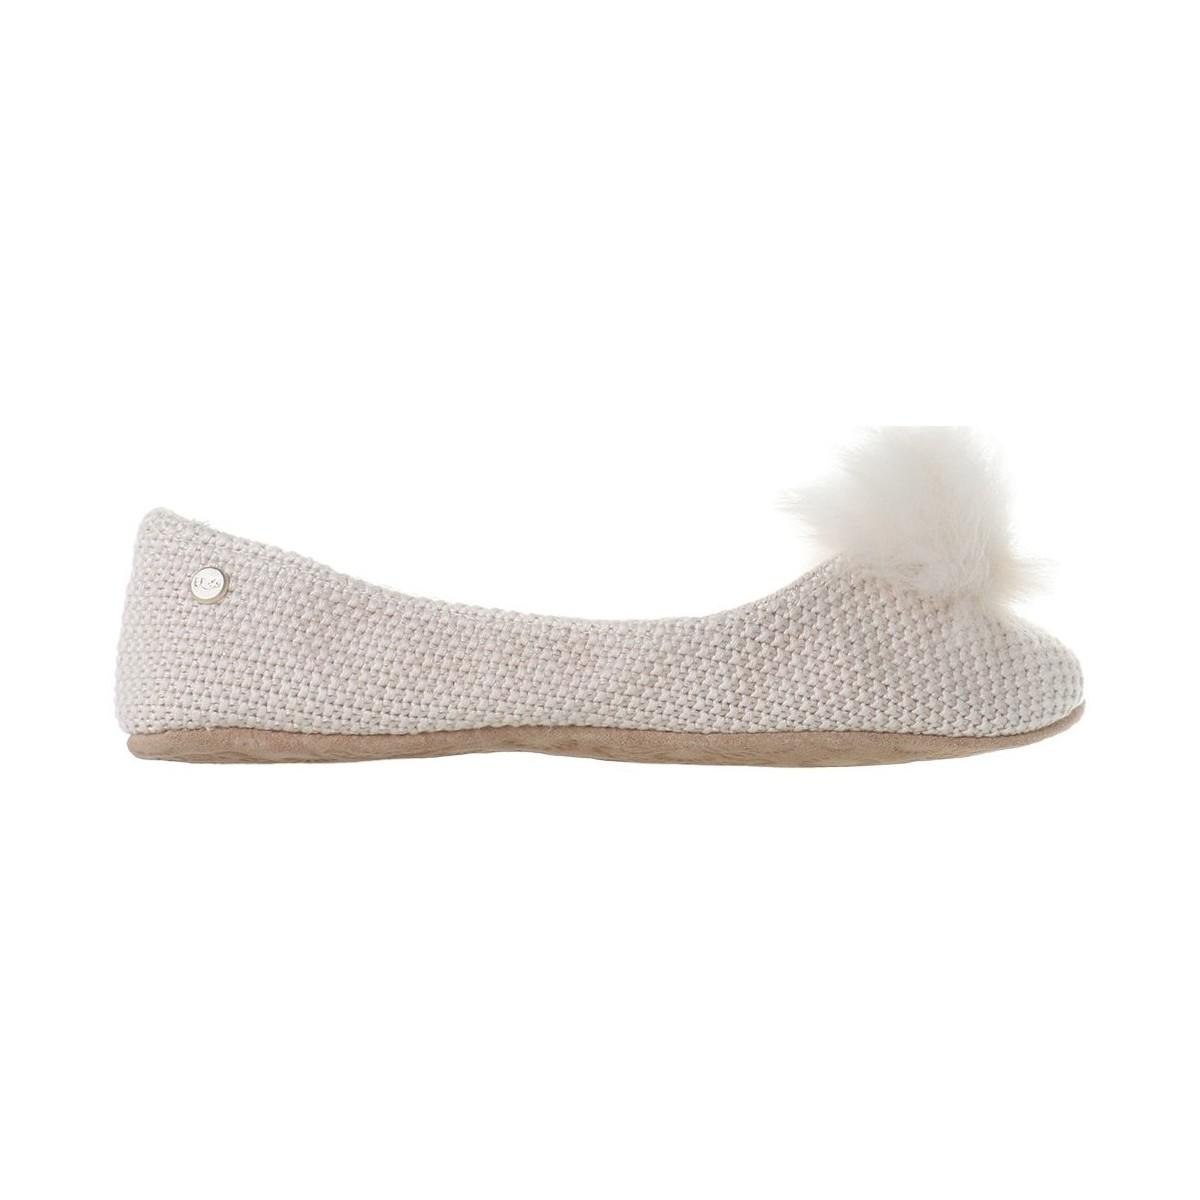 4e1a2bf60cb Ugg Andi Cream Women s Shoes (pumps   Ballerinas) In Beige in ...